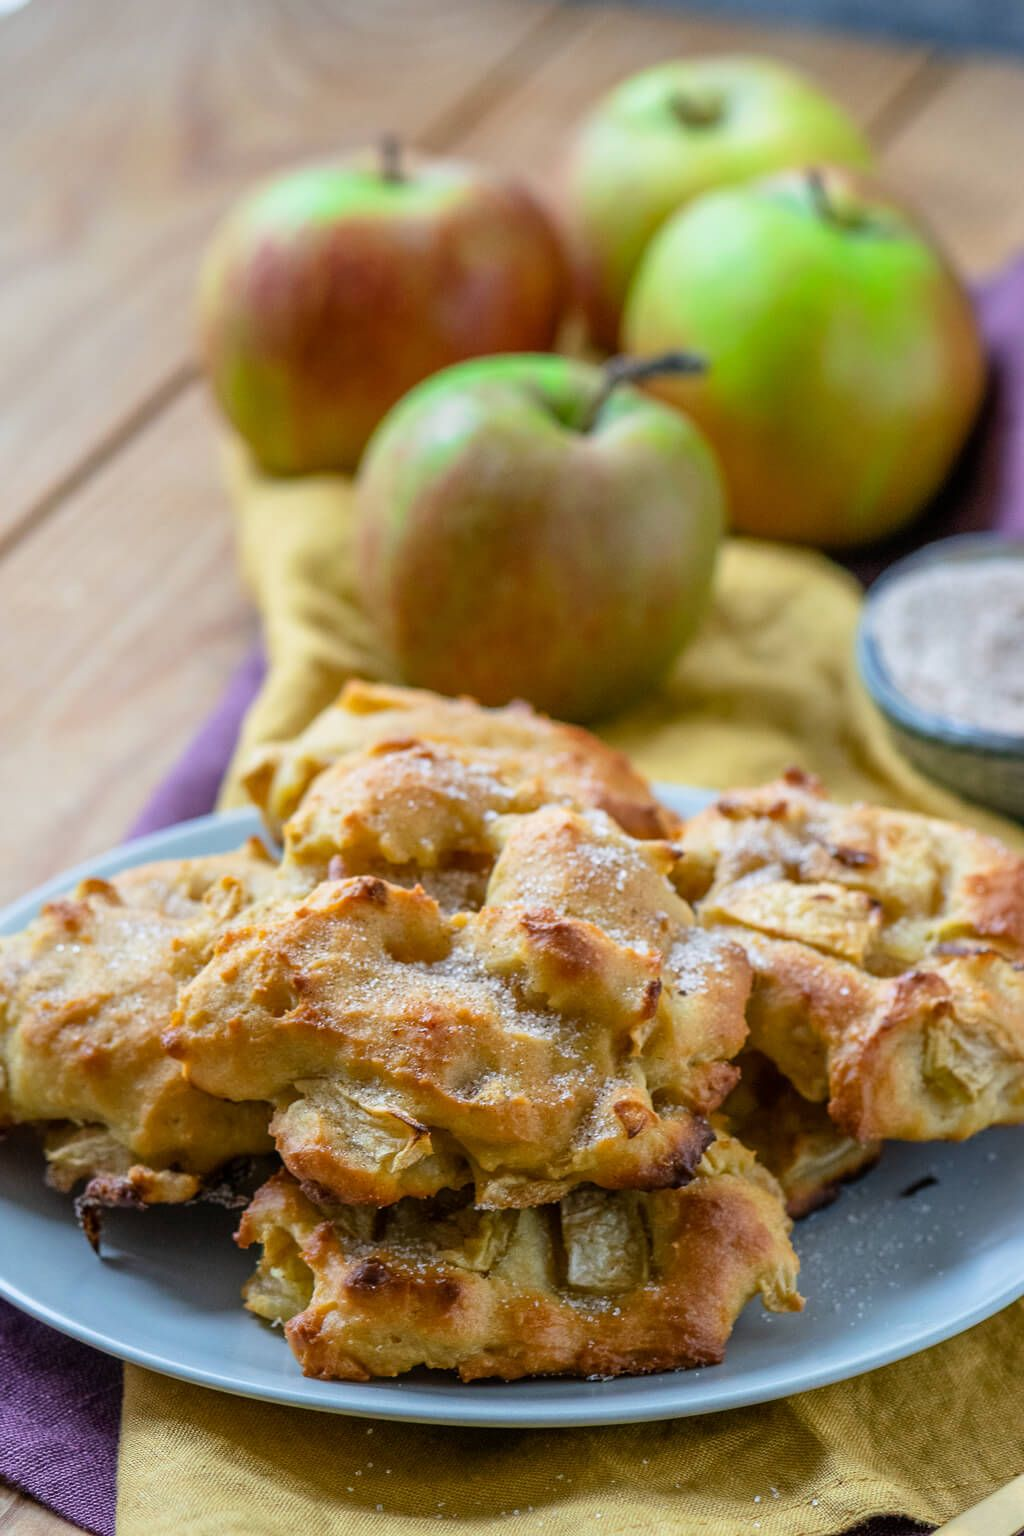 Saftige Apfel Zimt Taler Einfach Malene Rezept Apfel Zimt Kuchen Zimtkuchen Lebensmittel Essen